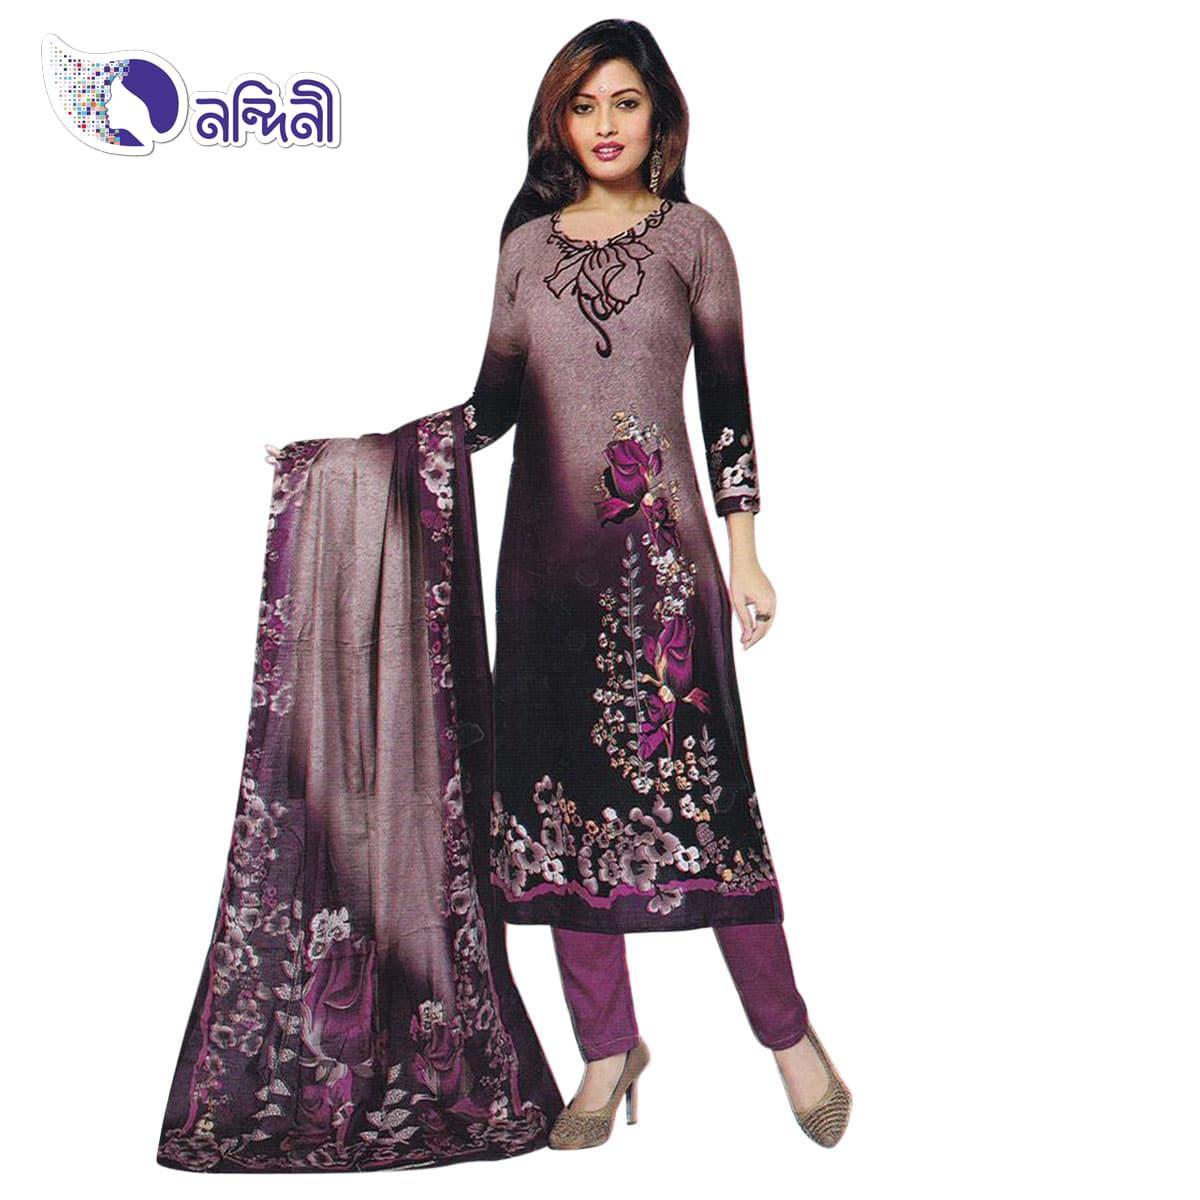 646bf1f9ca Women's Clothing Online: Buy Ladies Clothes in Bangladesh | Daraz.com.bd